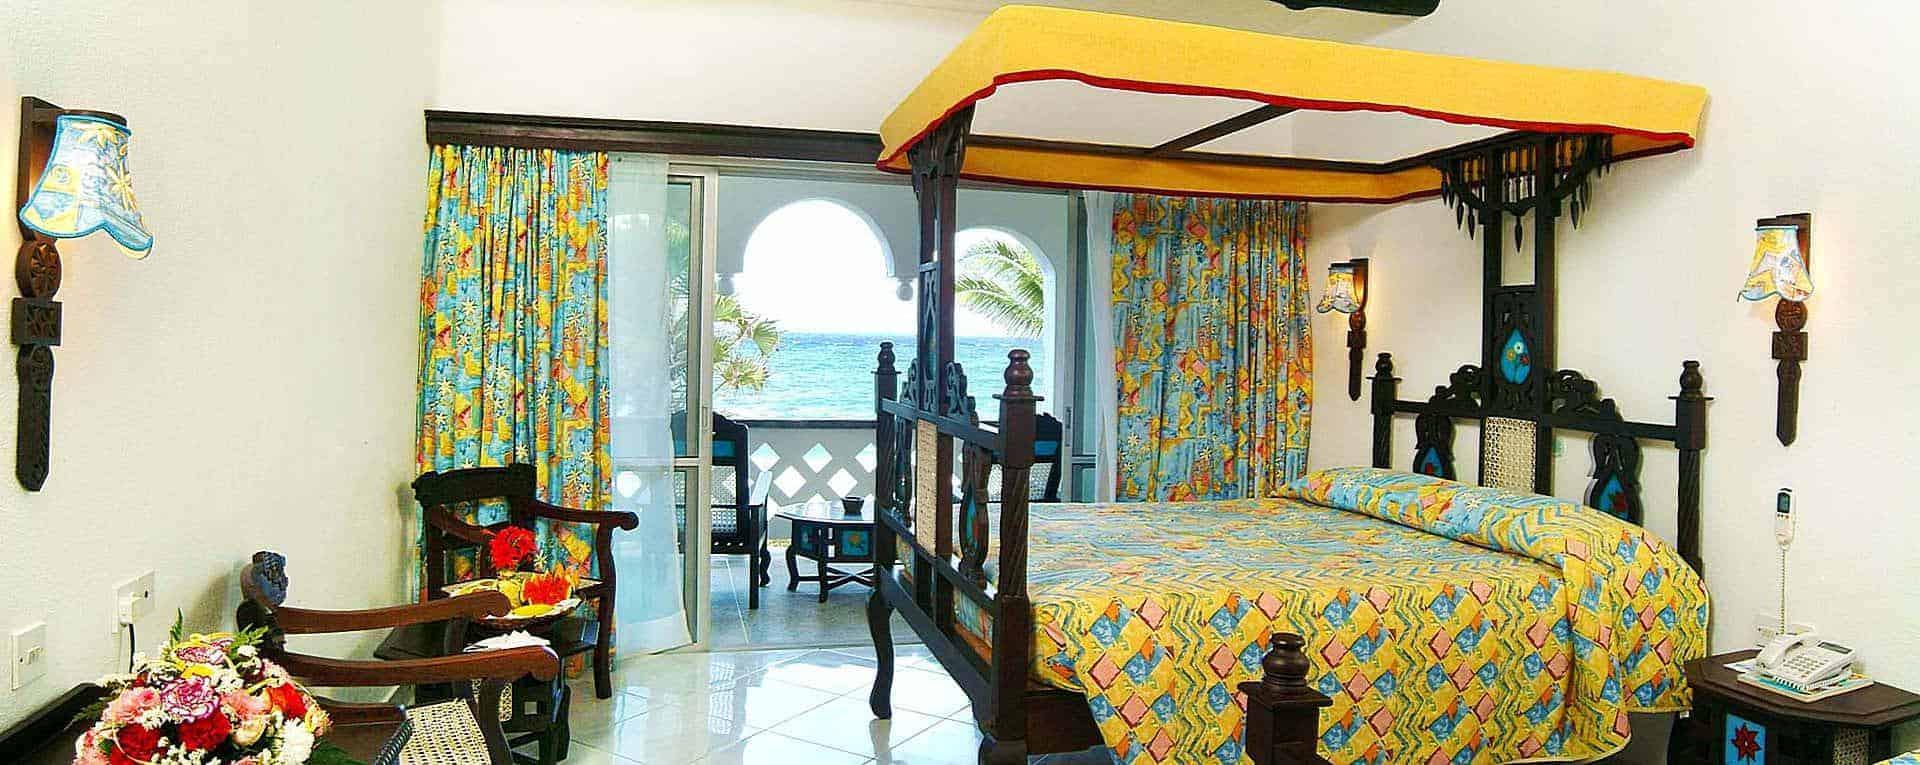 Southern Palms Beach Resort 5